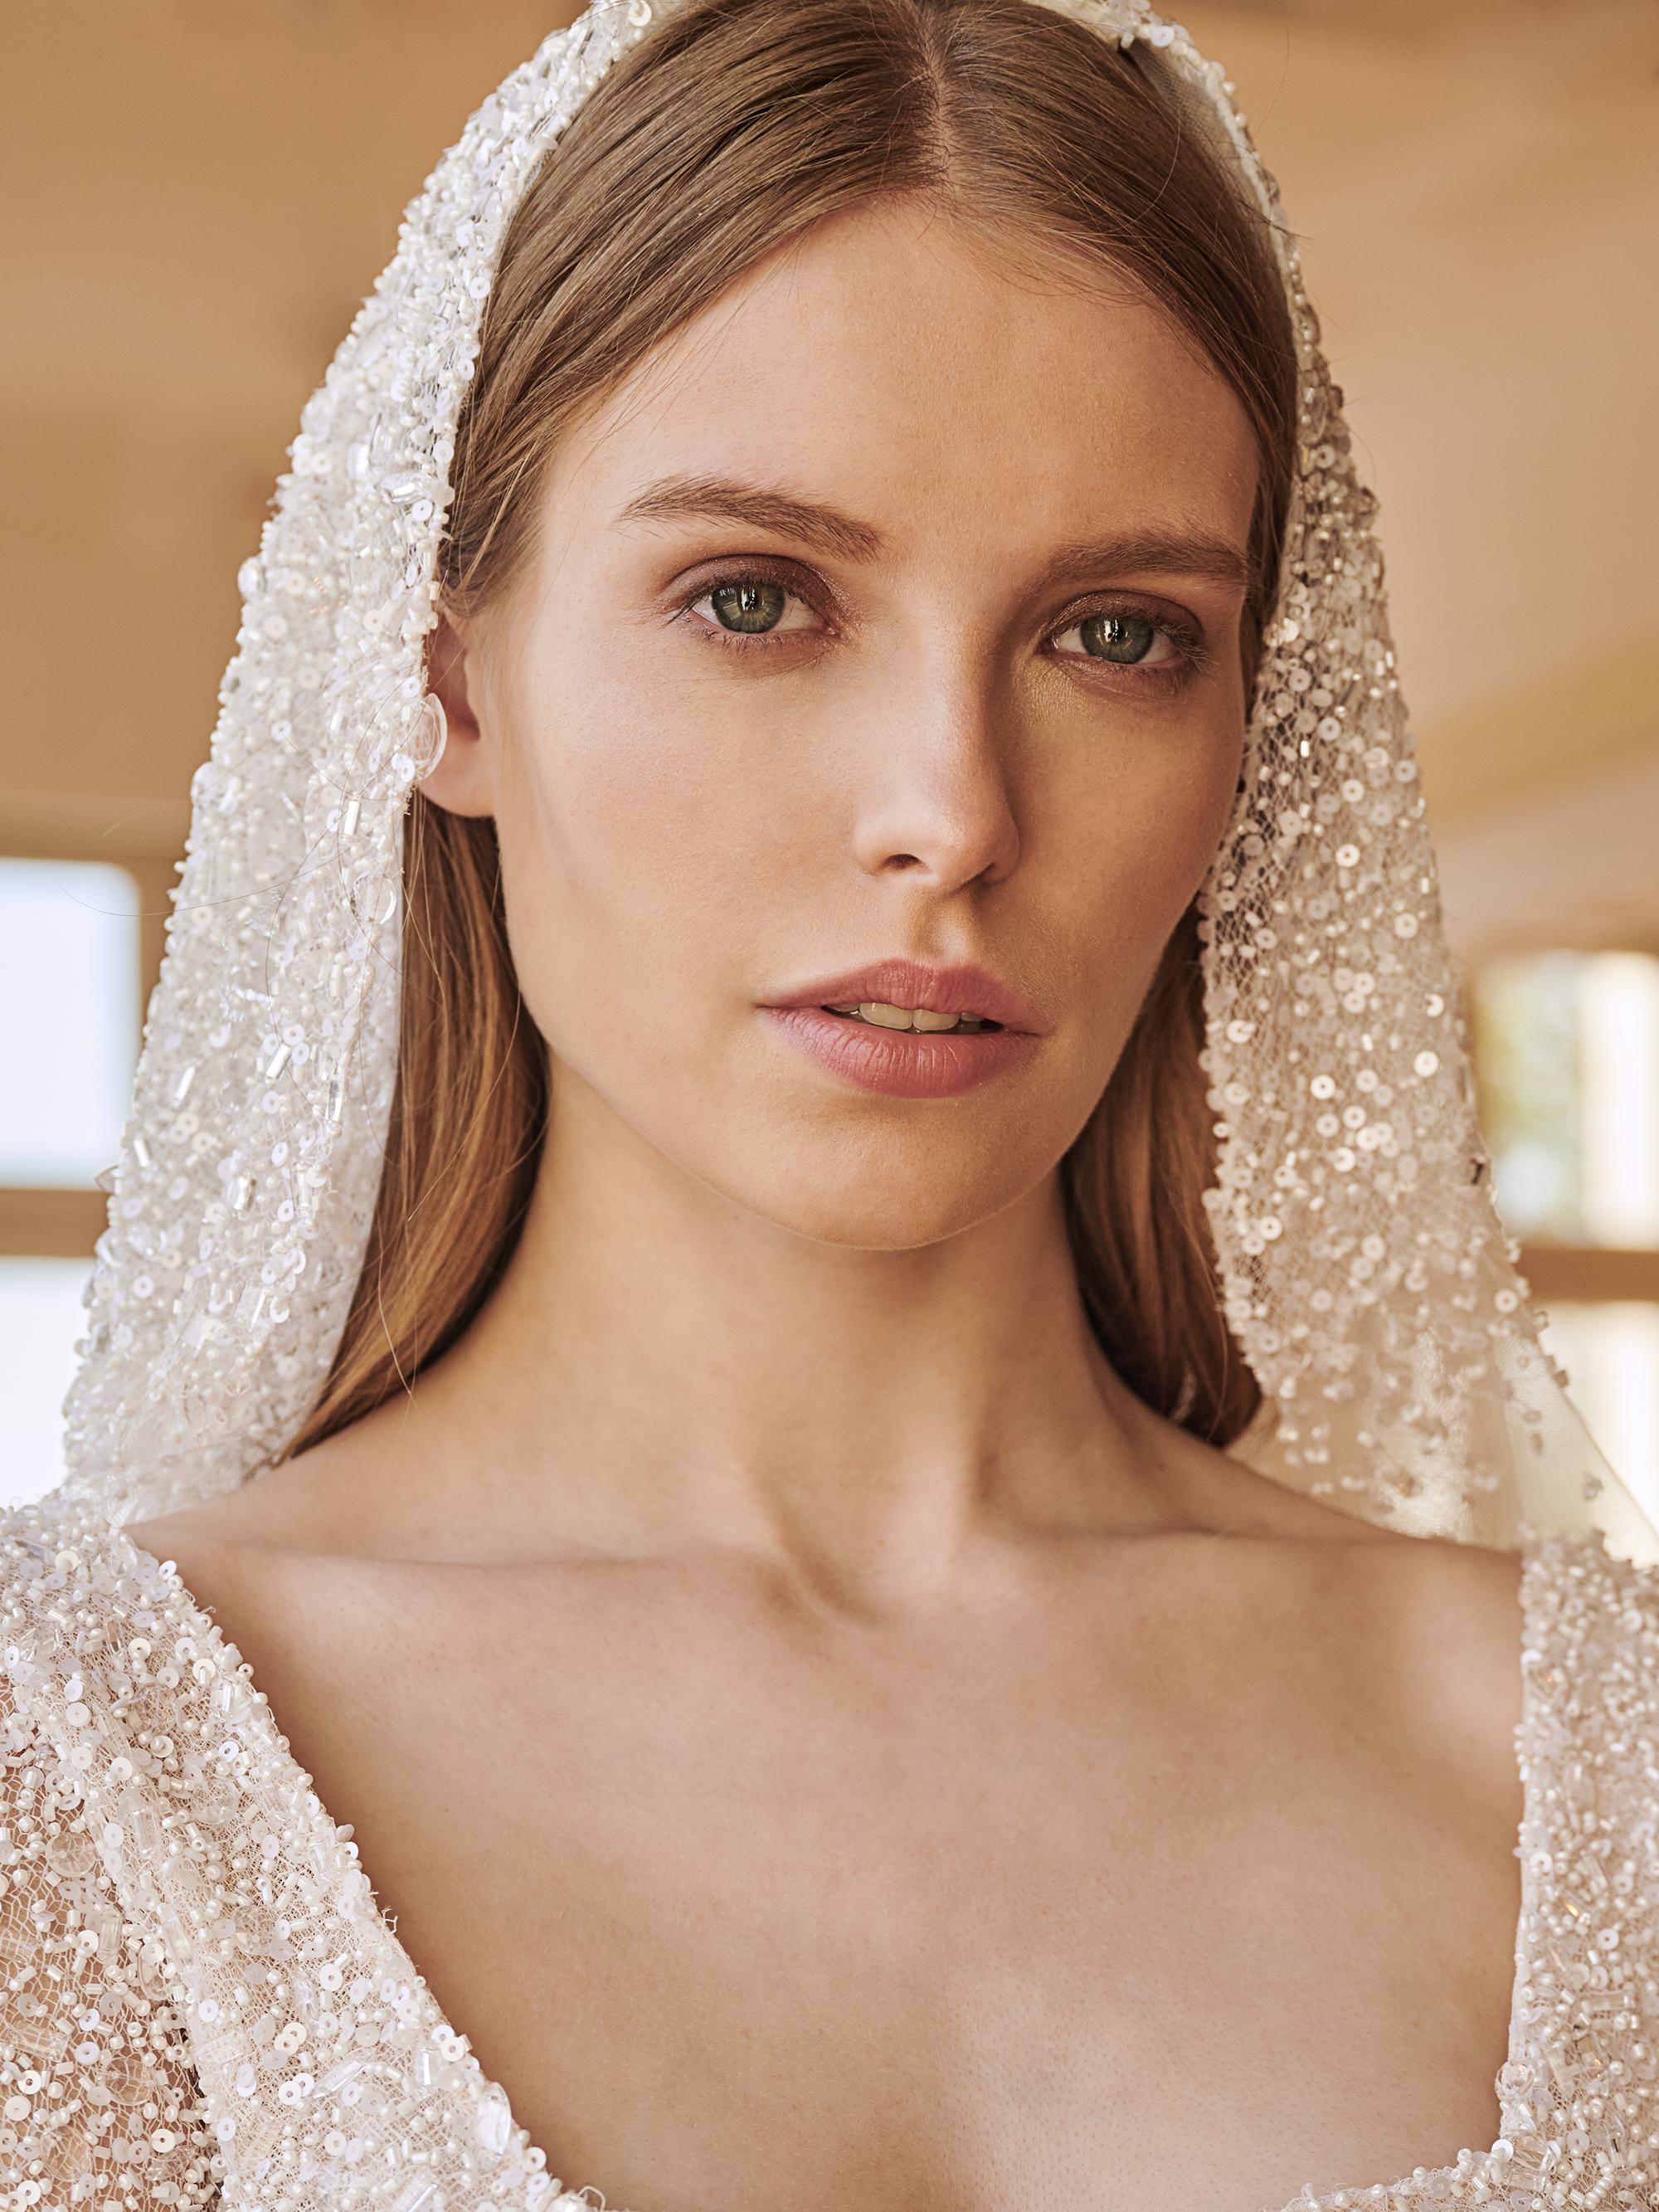 Stunning wedding dresses by Mairi Mparola